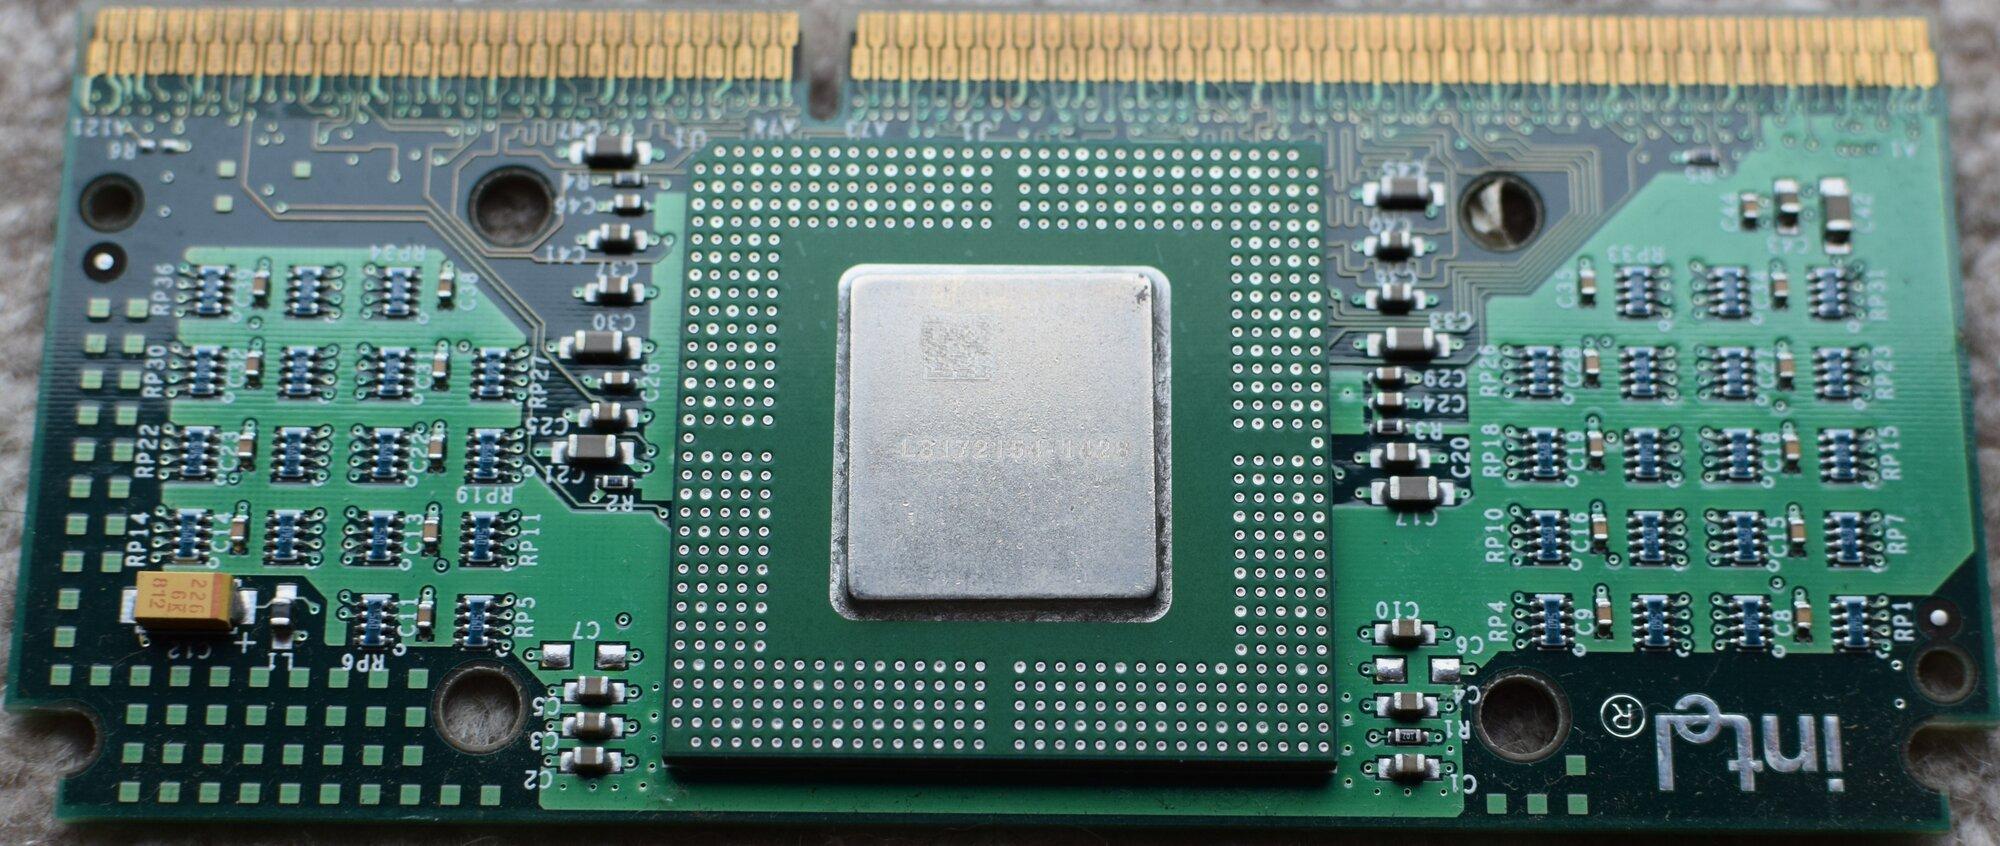 Intel slocket  soldered chip 266-66 front.JPG